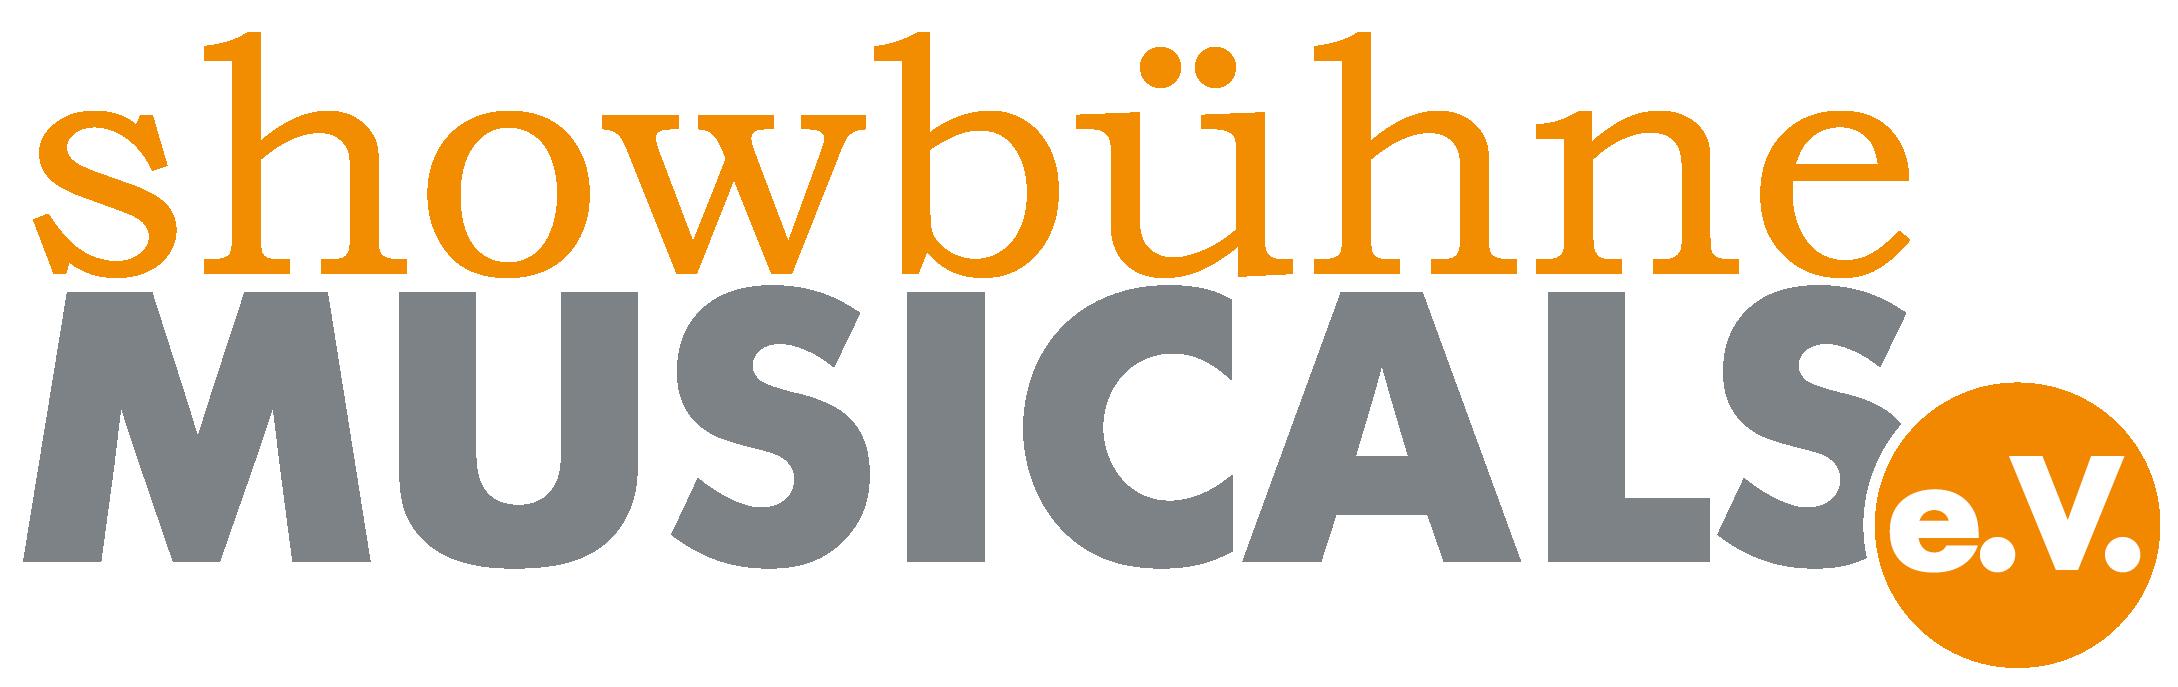 Showbuehne Musicals